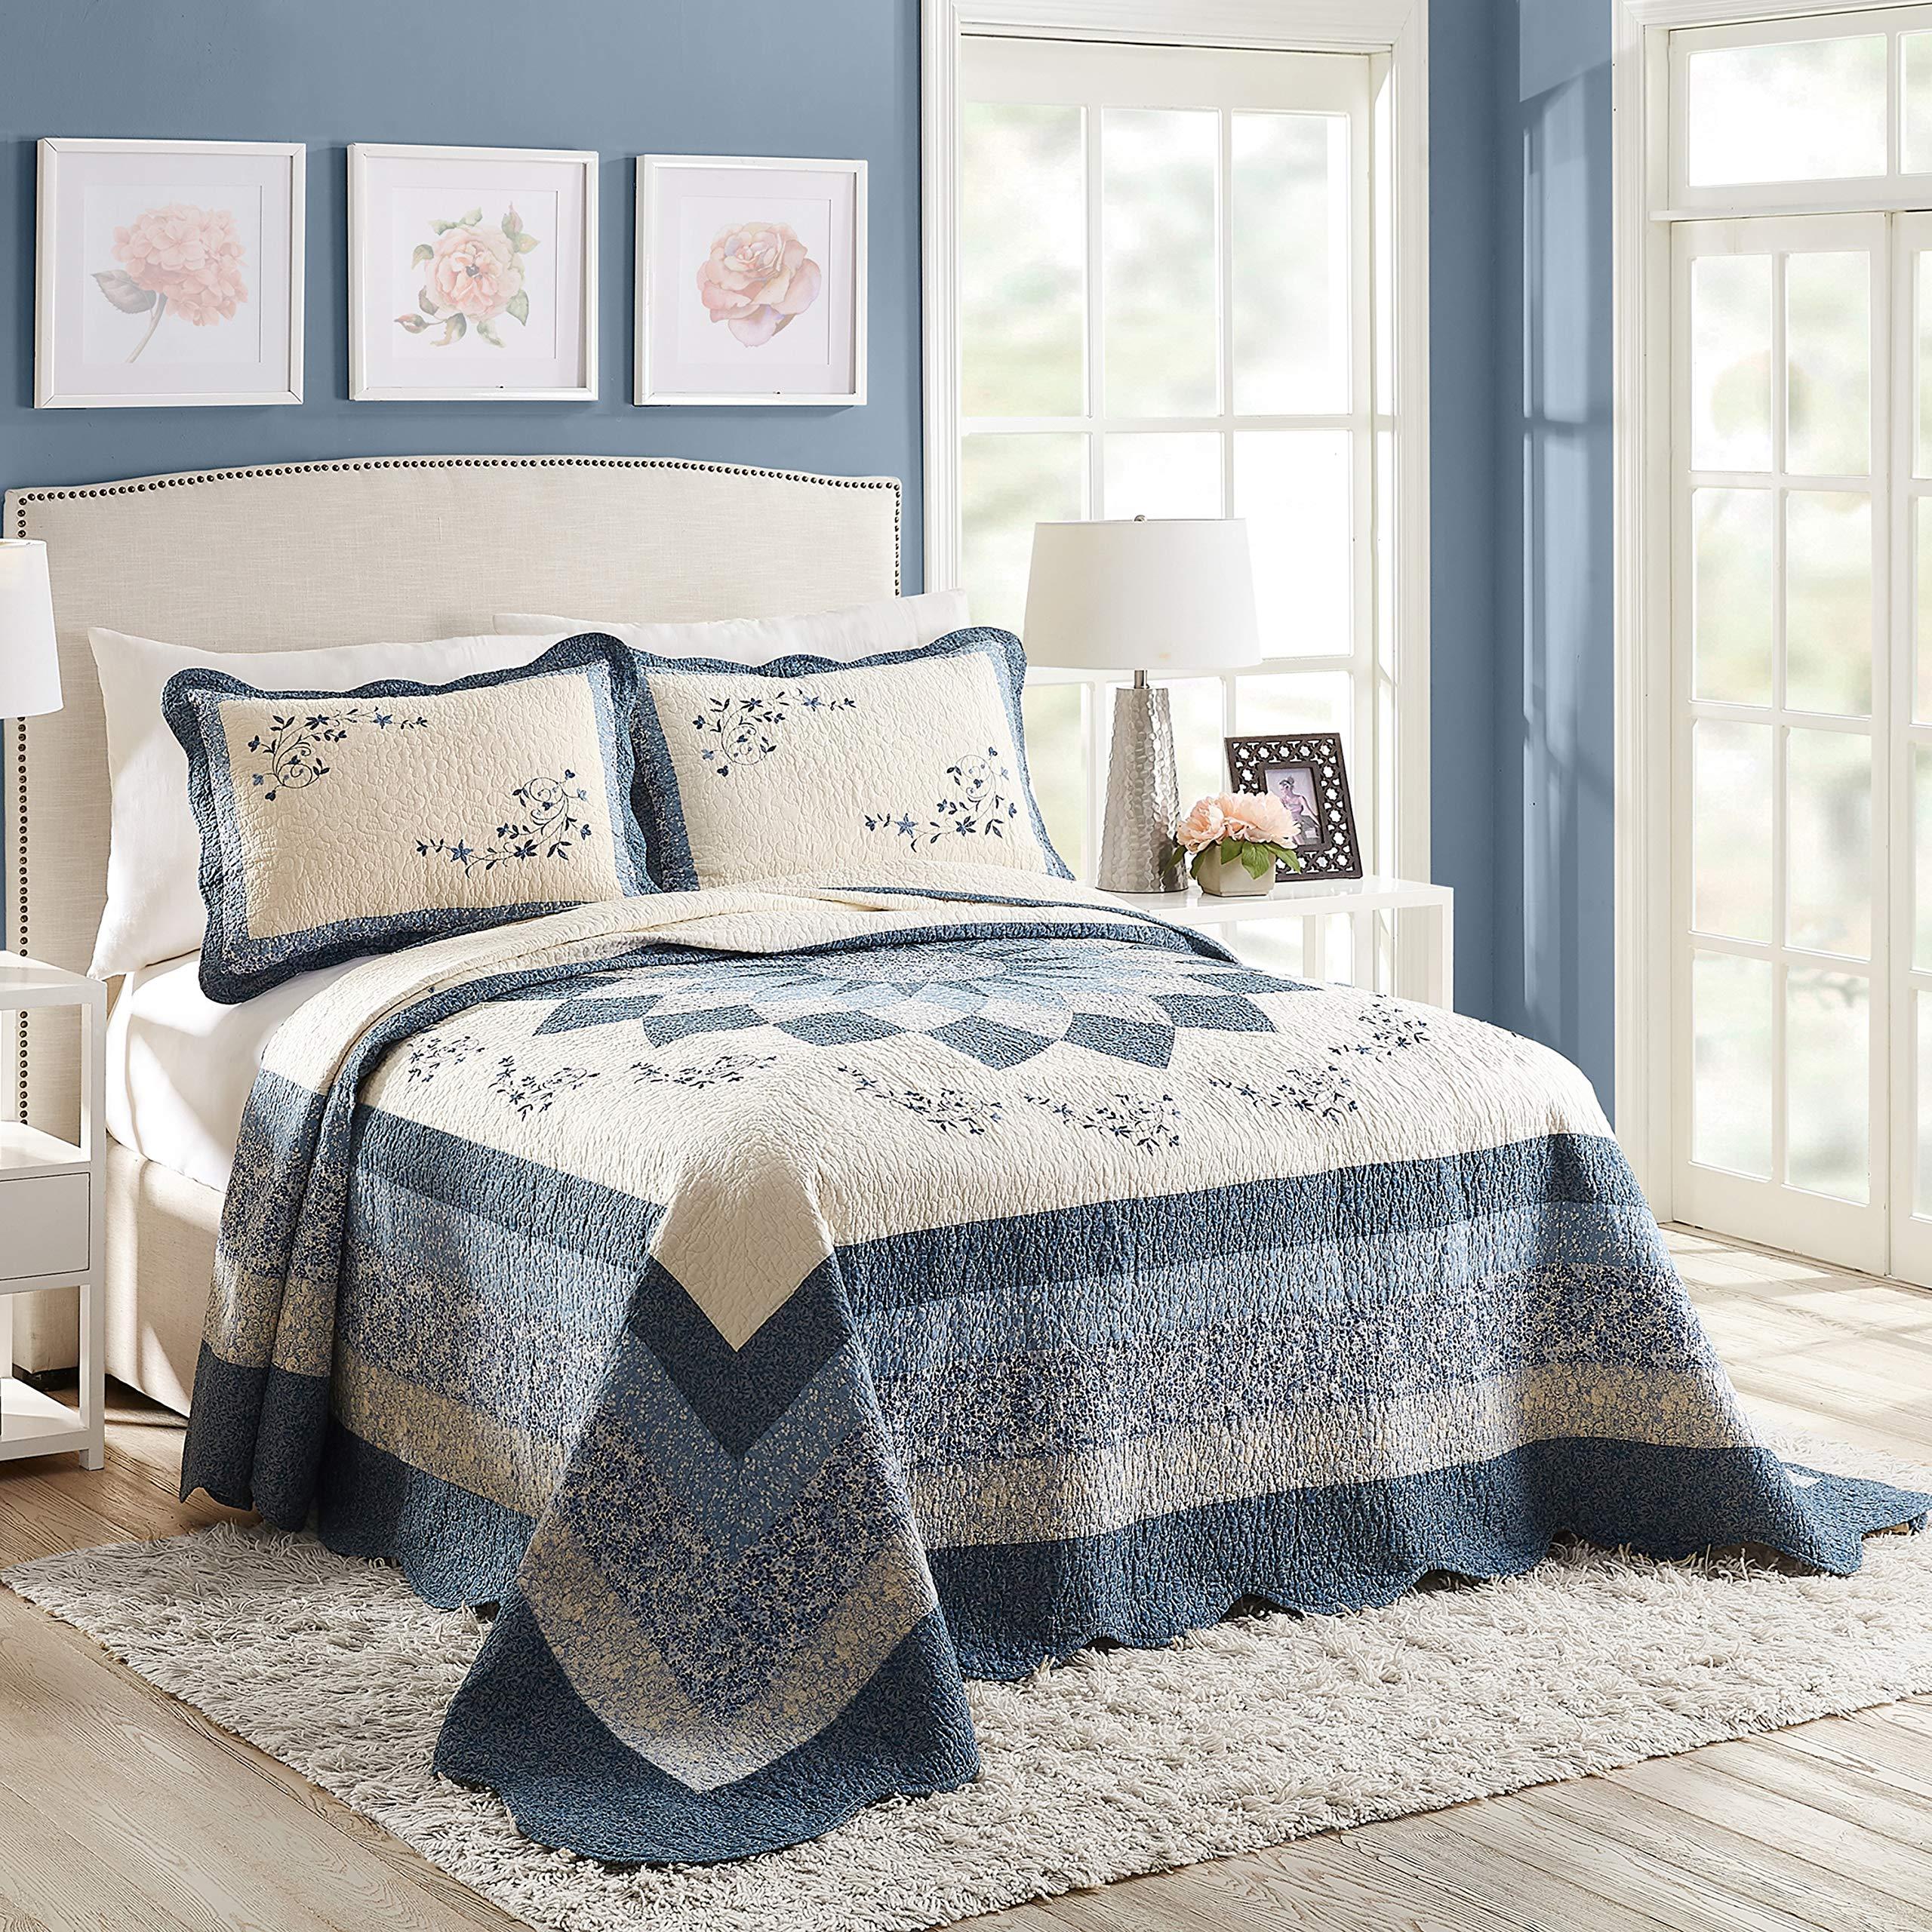 Modern Heirloom Collection Charlotte Bedspread, King, Blue by Modern Heirloom Collection (Image #1)